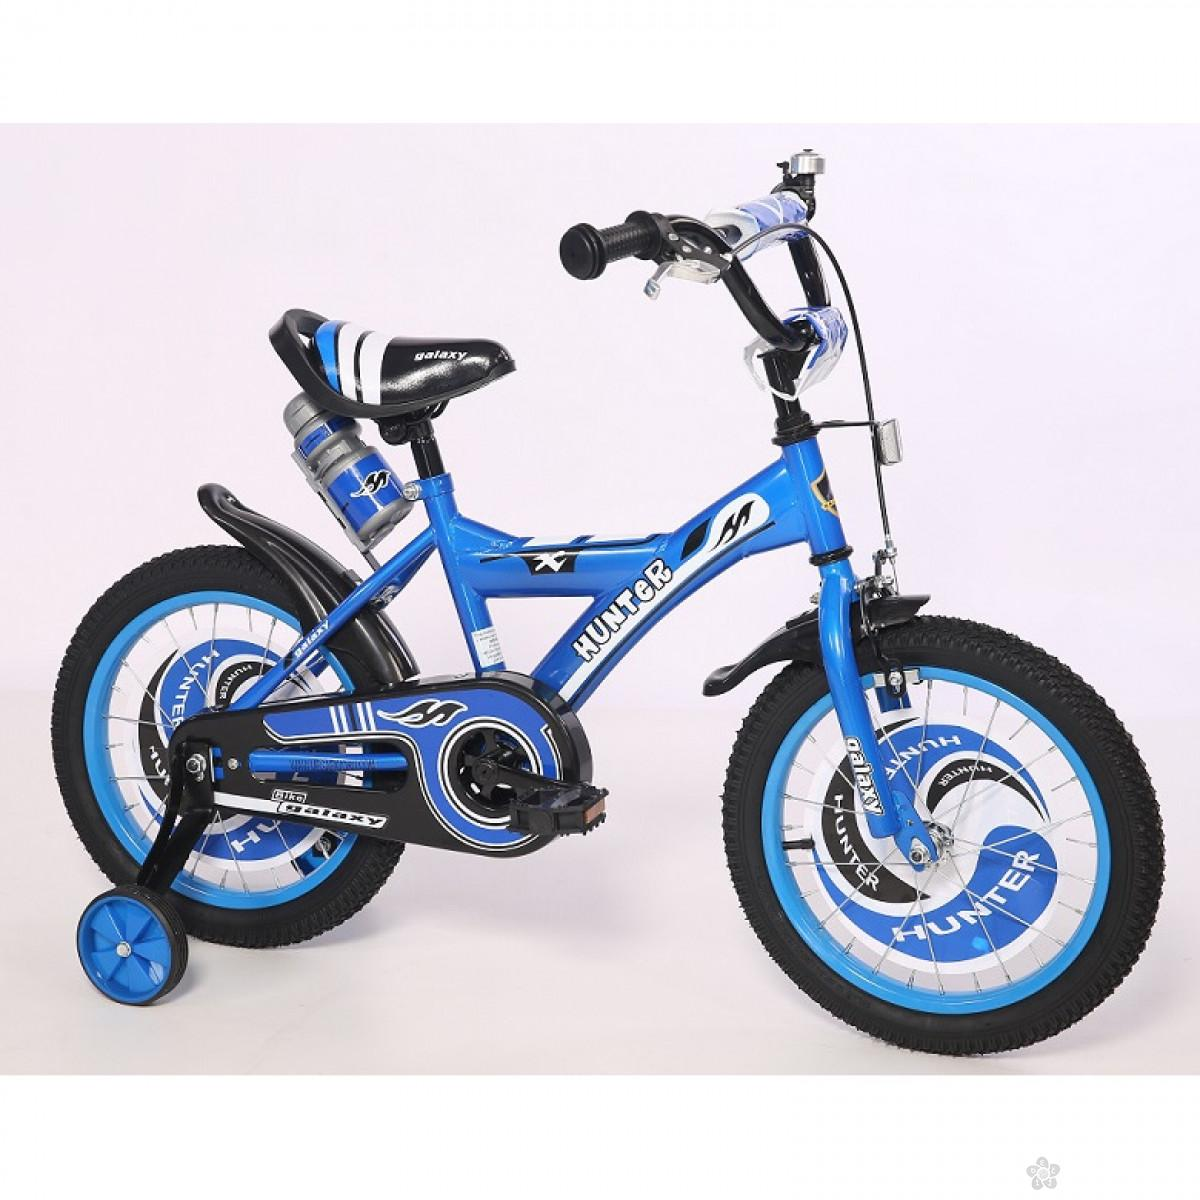 Dečiji Bicikl Hunter 16 plava/bela, 460455